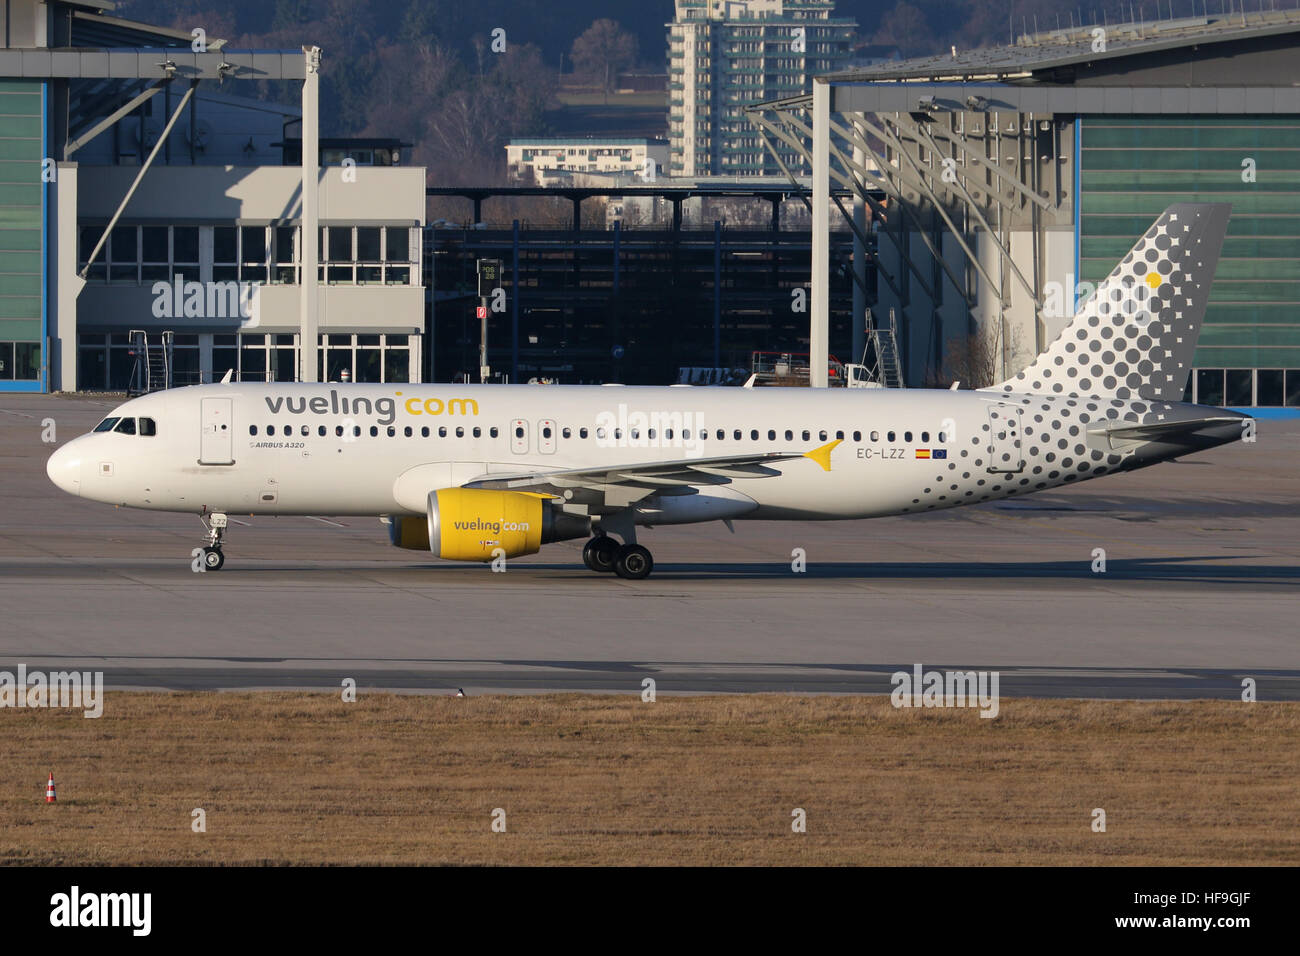 Stuttgart, Germany – December 29, 2016: Vueling, Airbus A320 at Stuttgart Airport - Stock Image